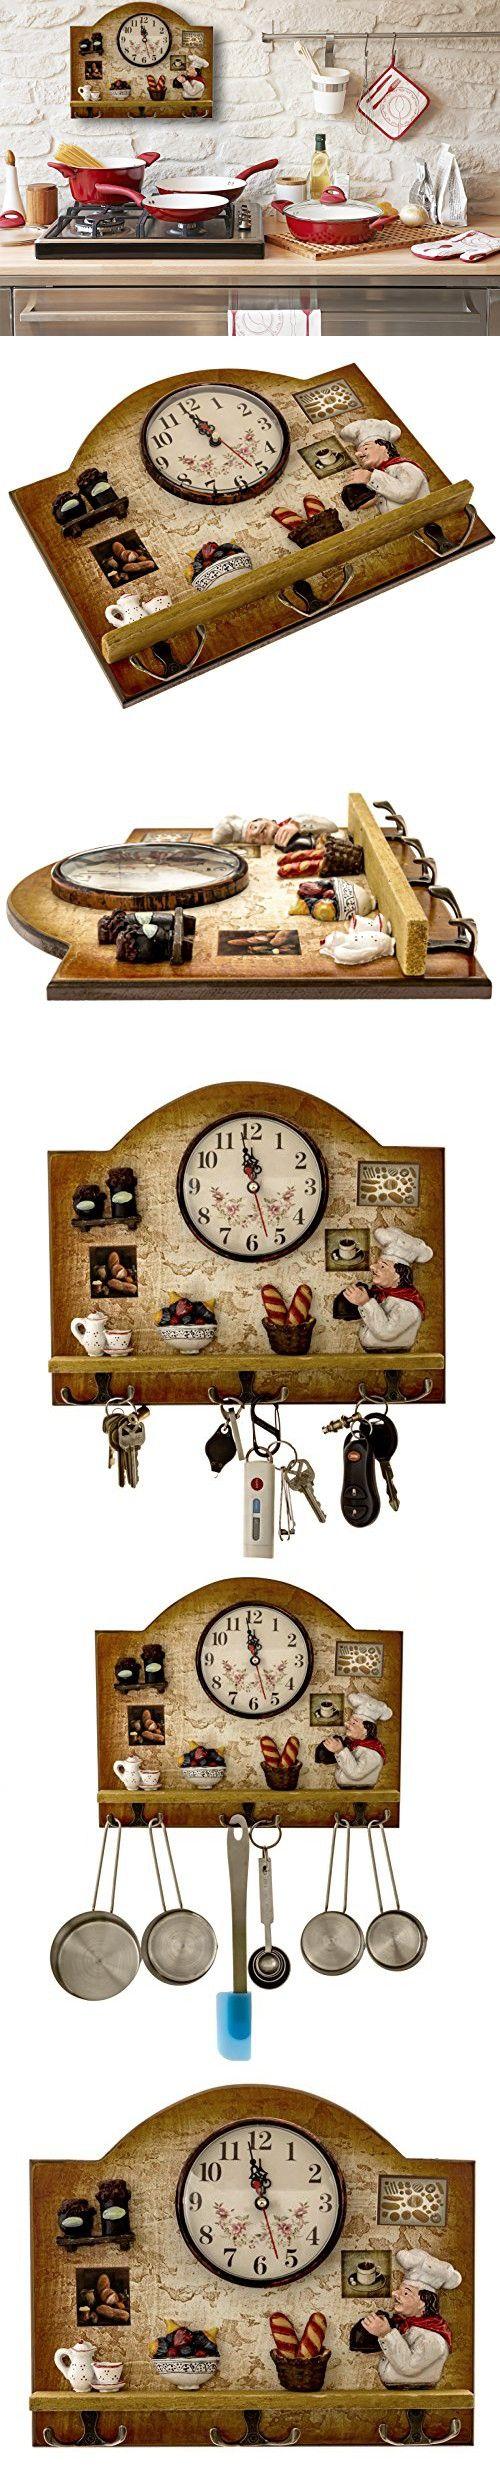 Heartful Home Fat Italian Chef Kitchen Decor Clock with Hooks - Unique Idea for a Wedding or Housewarming Present